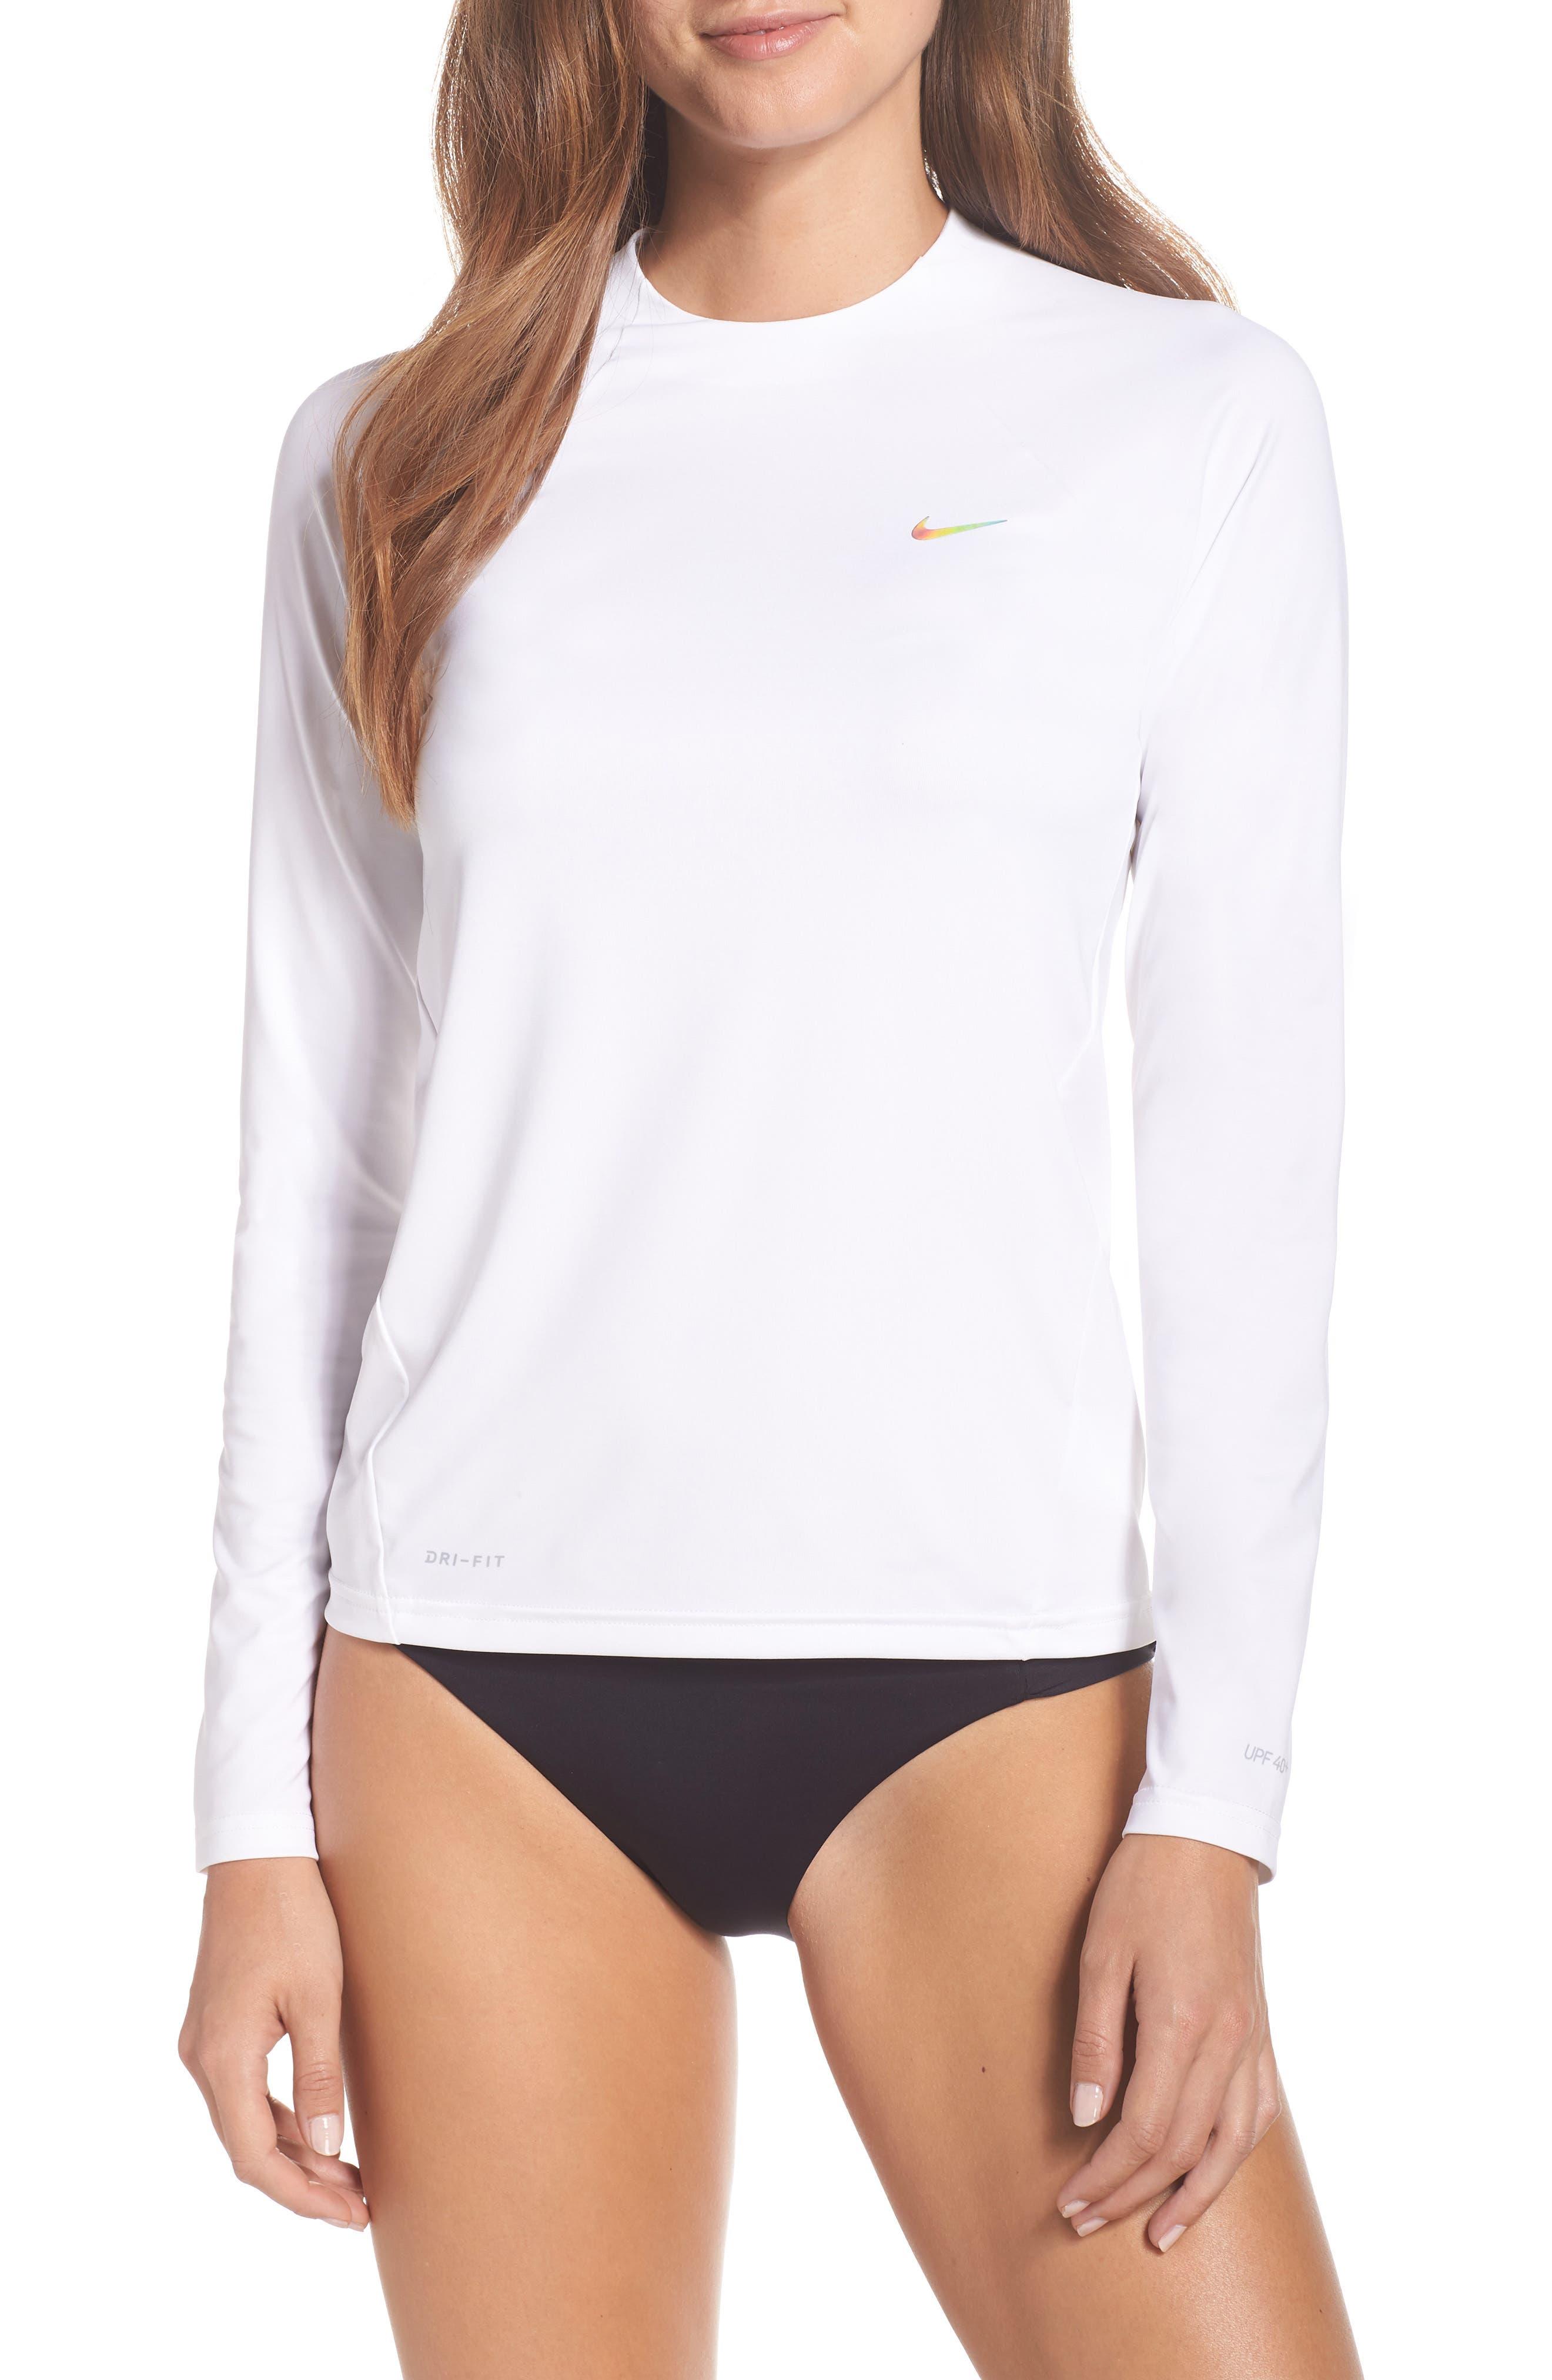 Nike Long Sleeve Hydroguard Shirt